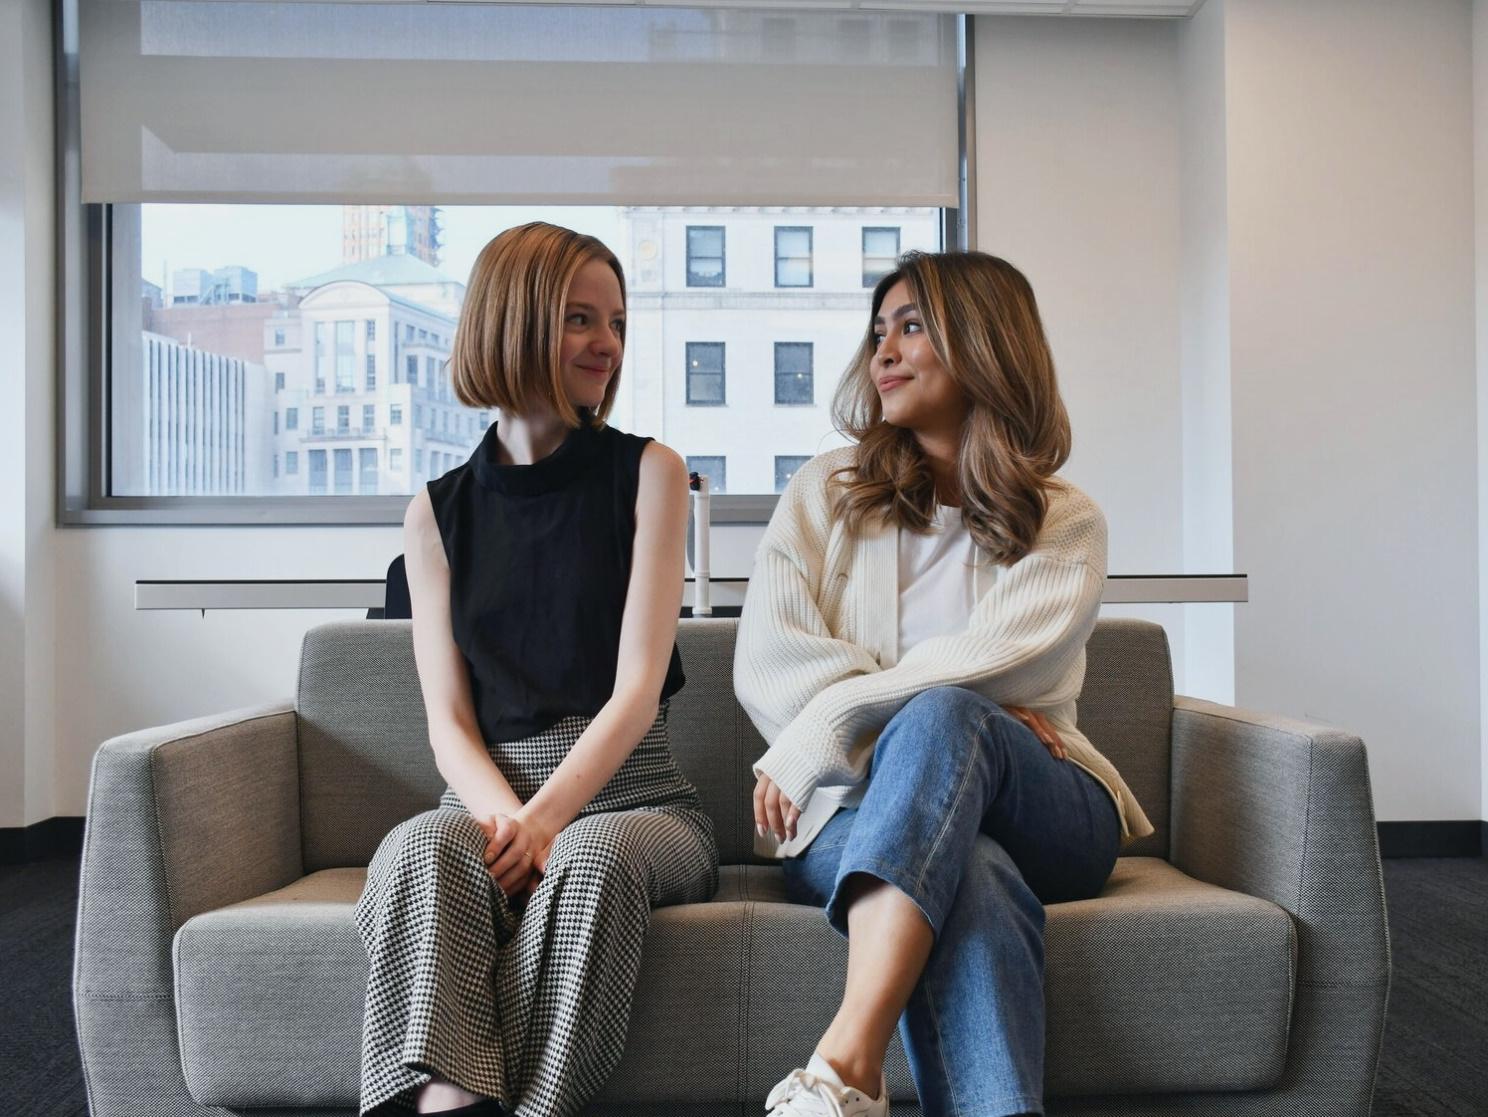 Liesel Vaidya and Madison Campbell